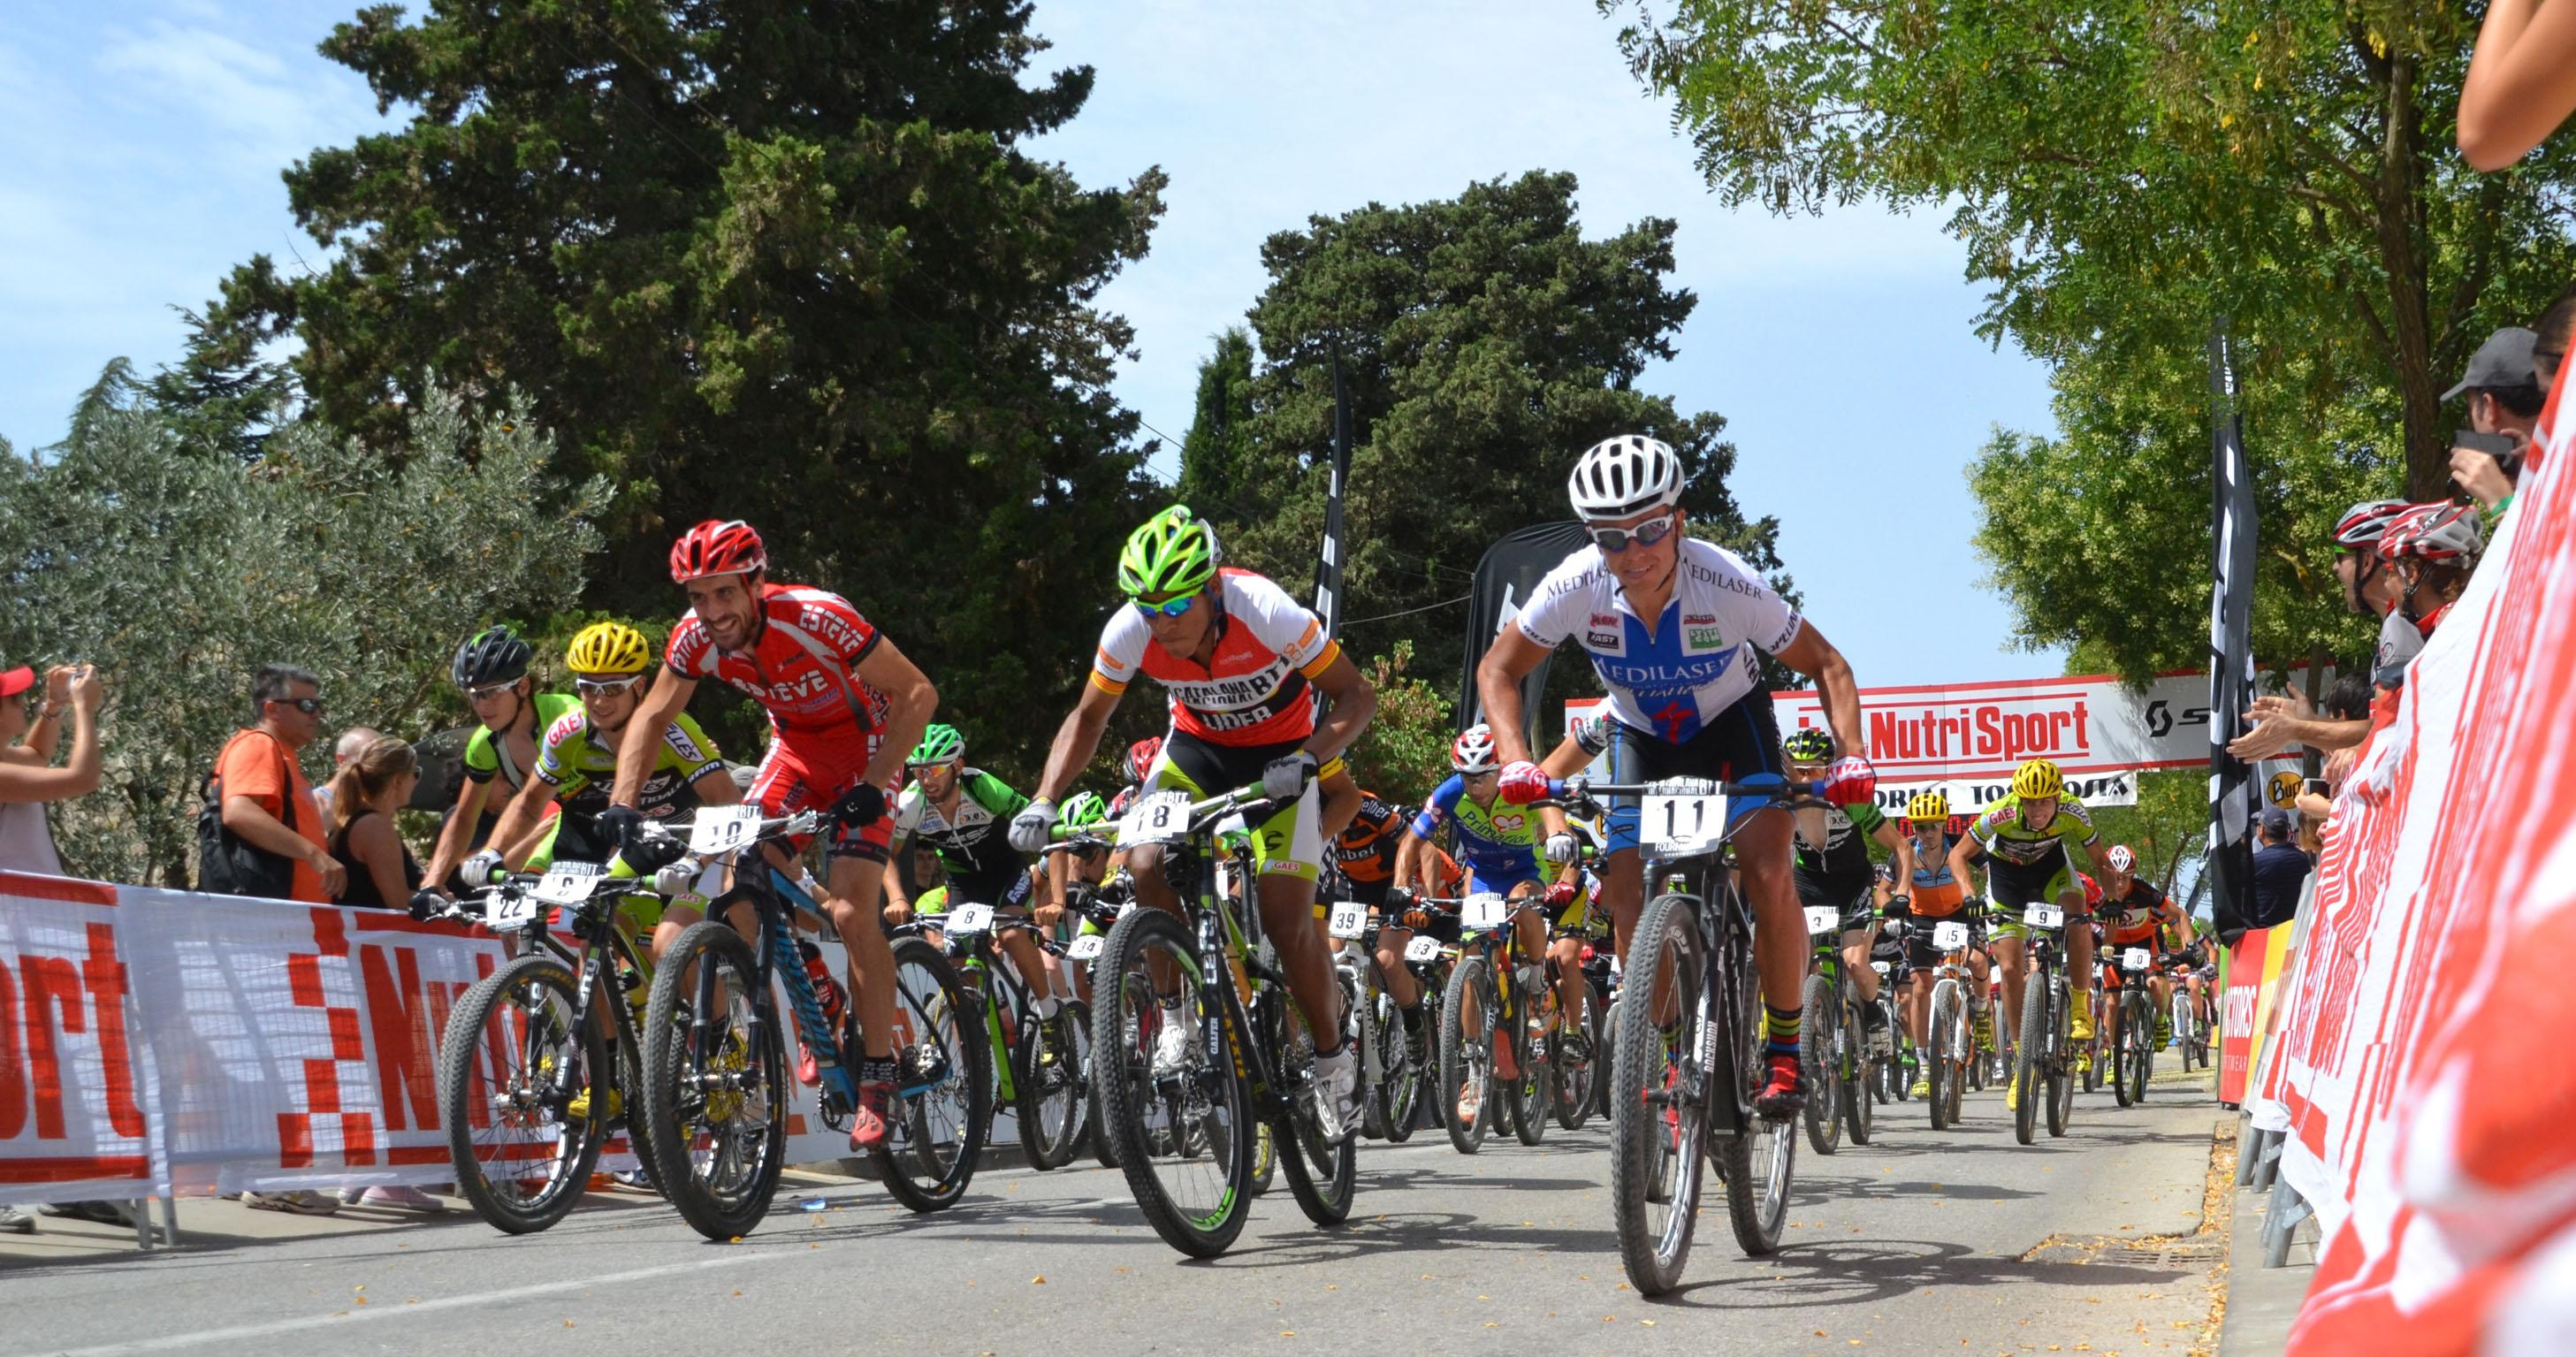 La Copa Catalana Internacional Biking Point de BTT se desplaza a Corr� d'Amunt este fin de semana